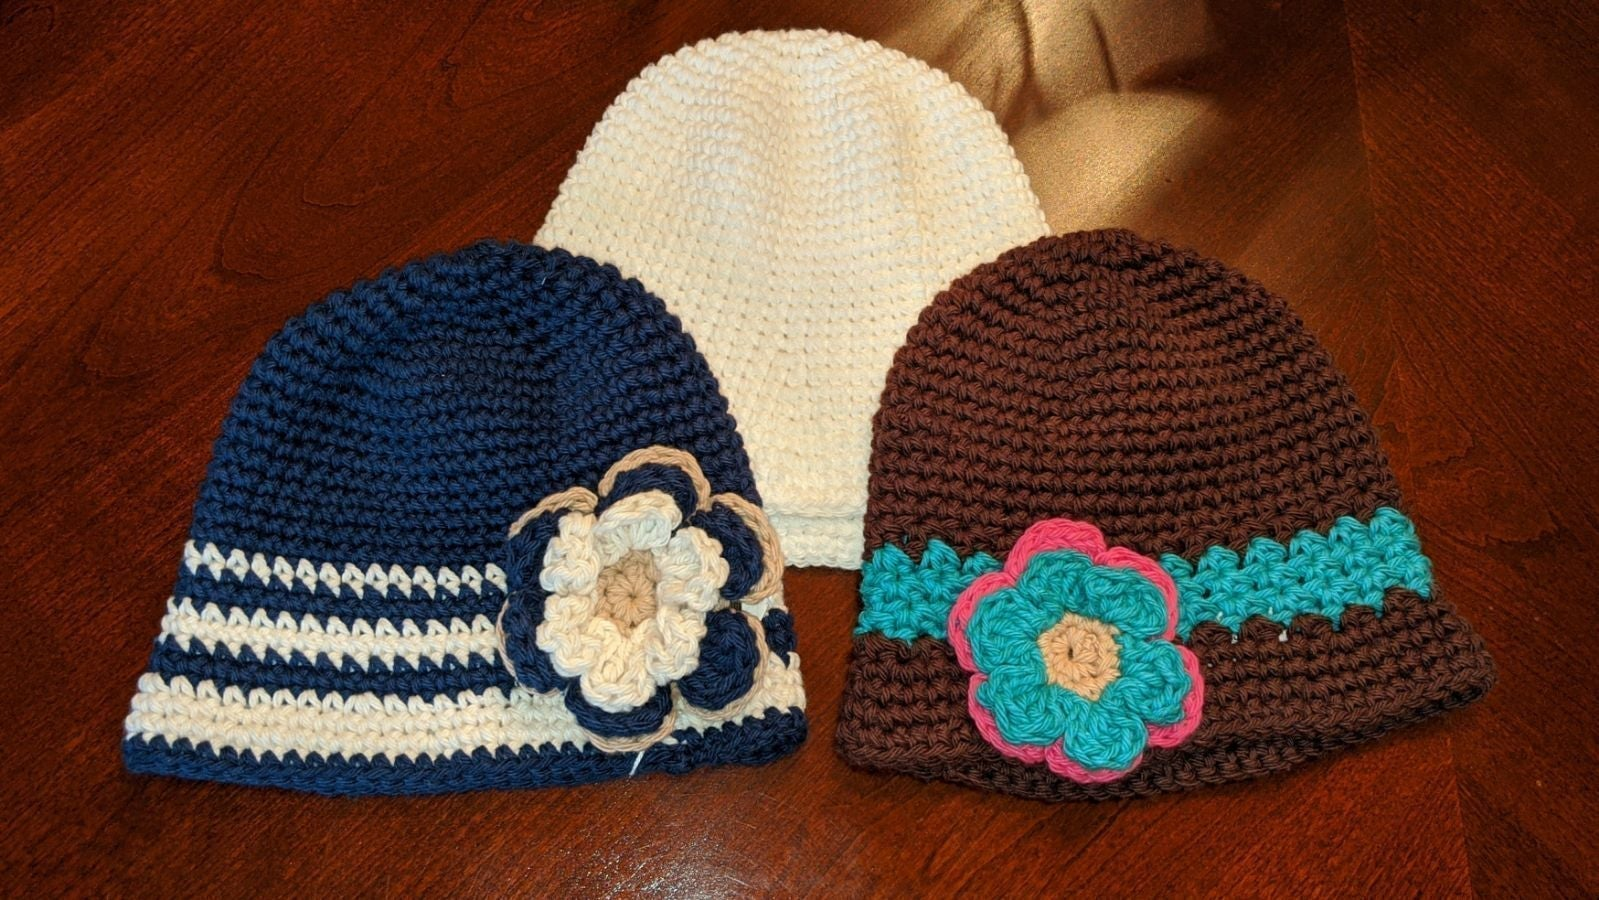 3 Handmade Infant Crochet Hats